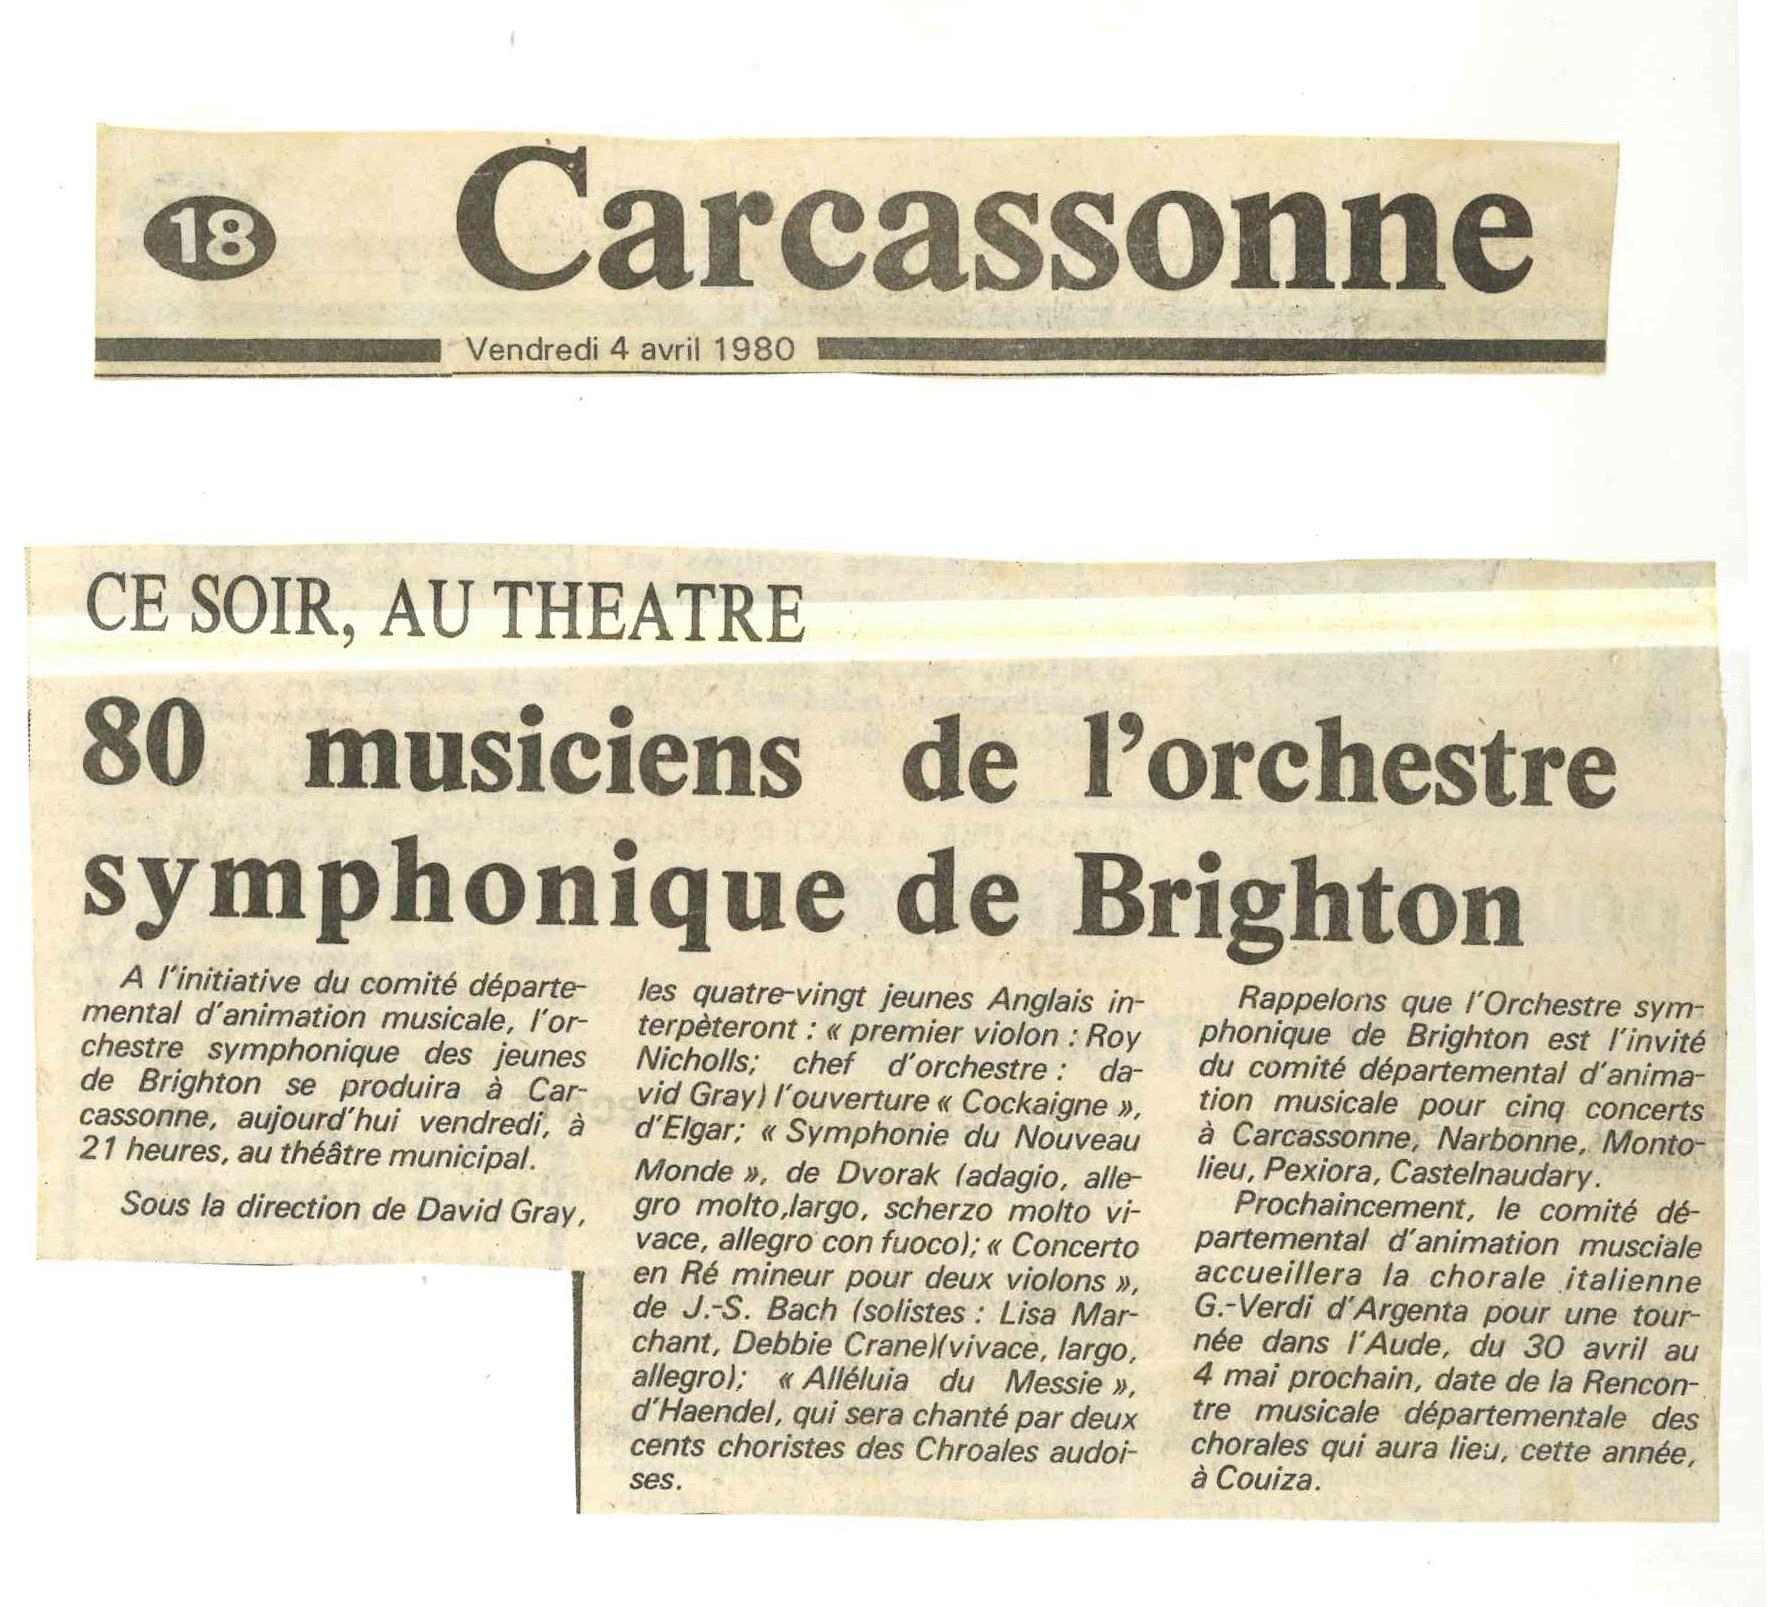 00190-Carcassonne, 4th April 1980.jpg